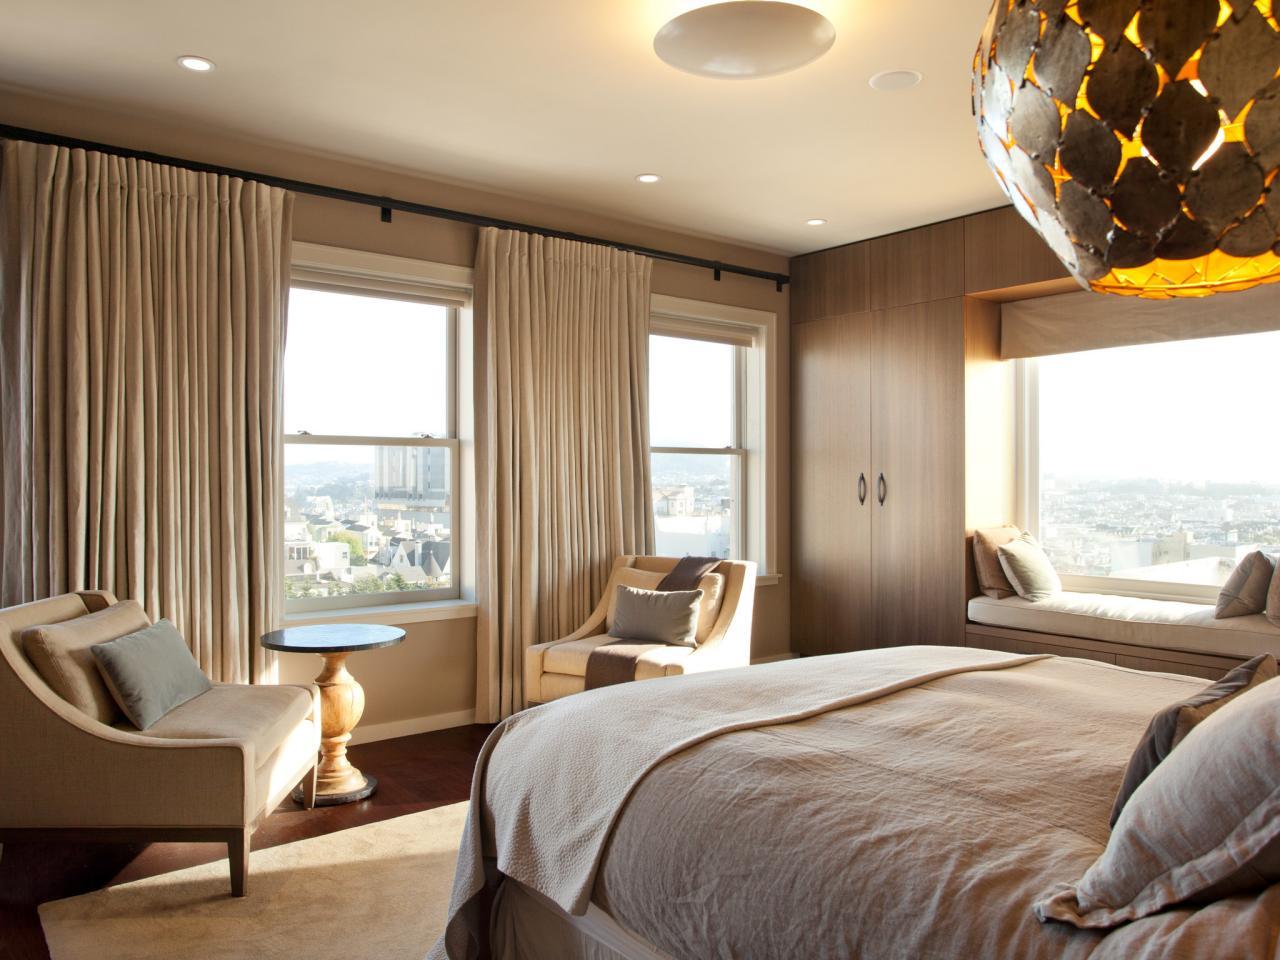 Dp gregg de meza neutral contemporary bedroom light h.jpg.rend.hgtvcom.1280.960